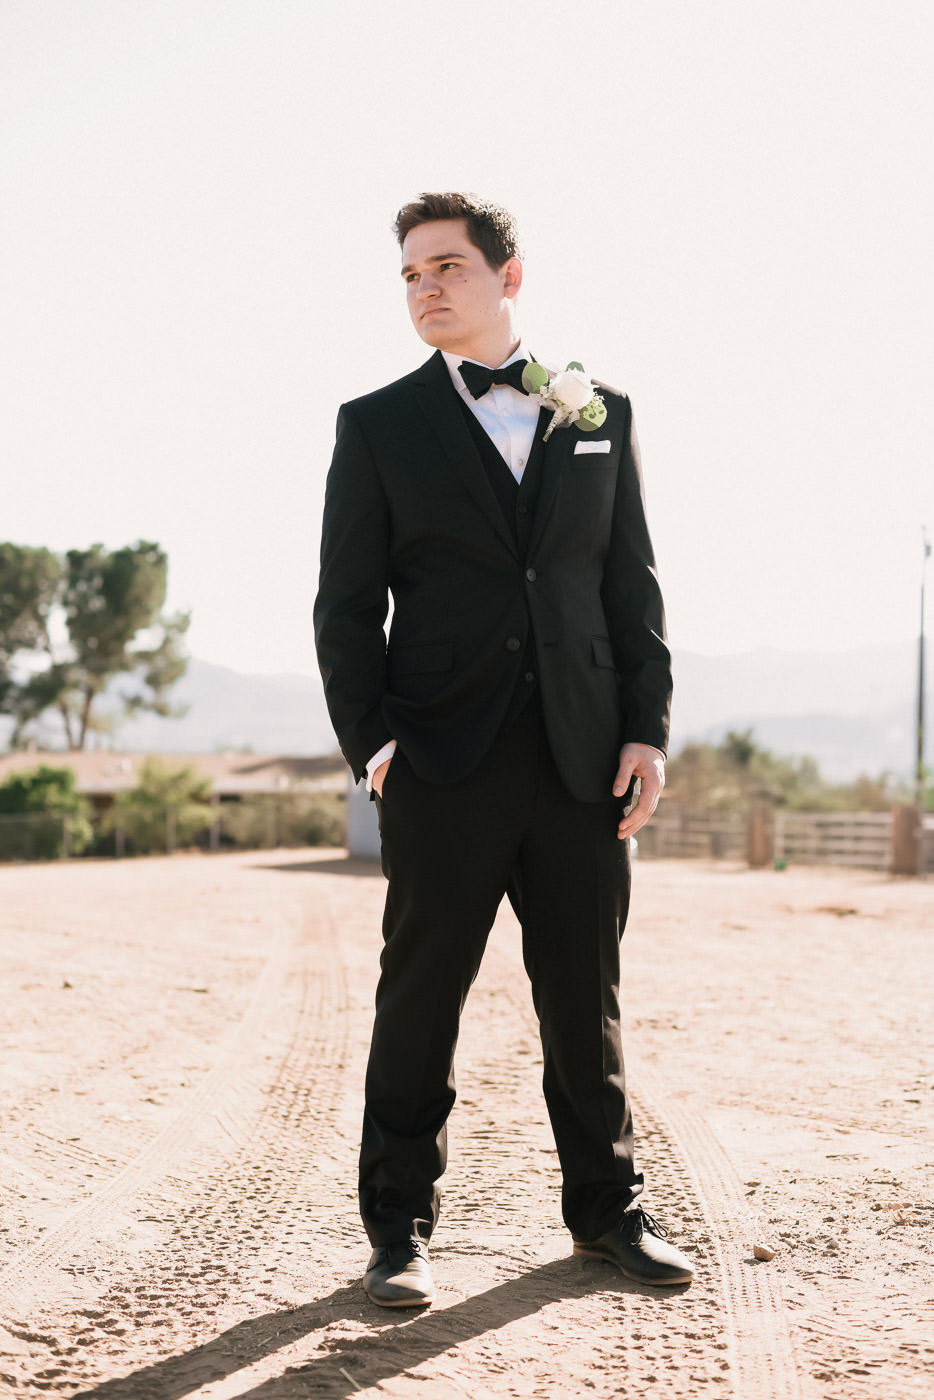 Handsome groom poses in his black suite in Temecula.